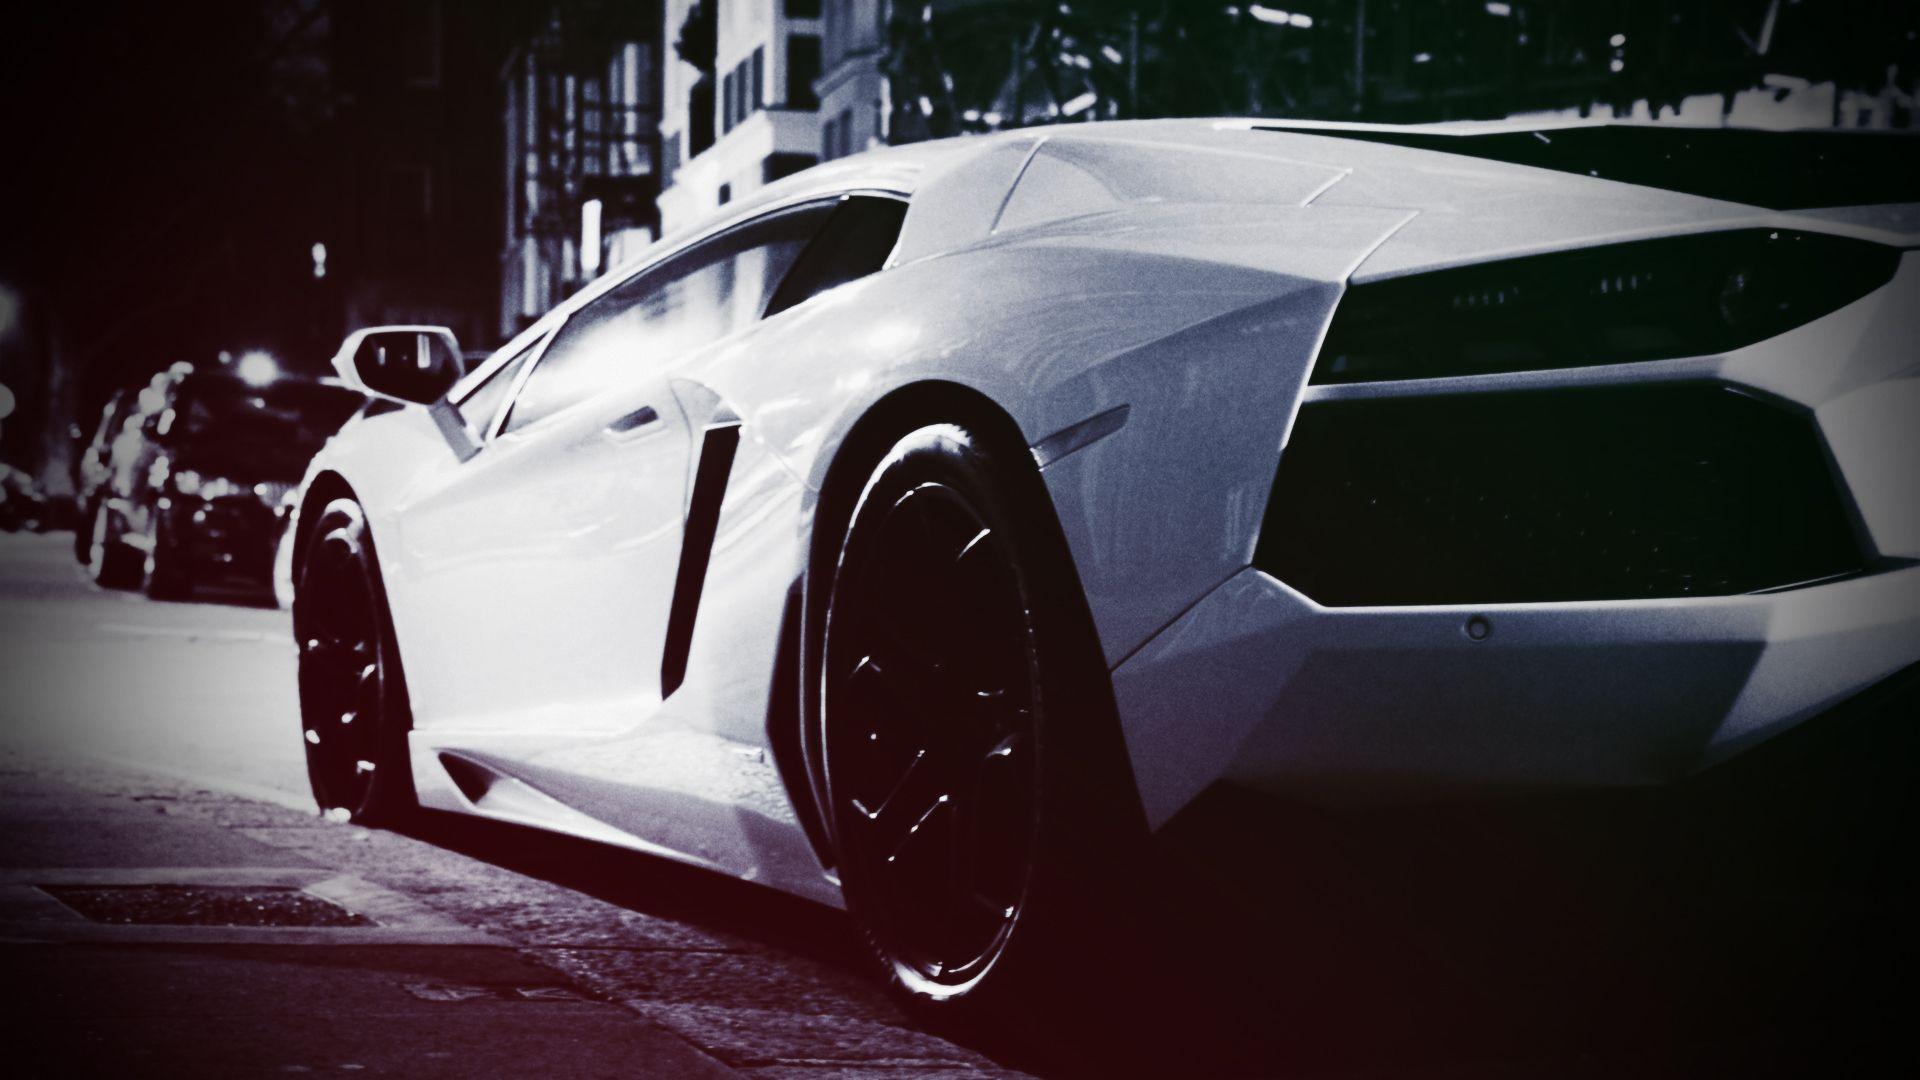 Lamborghini Aventador Wallpaper Hd 1920x1080